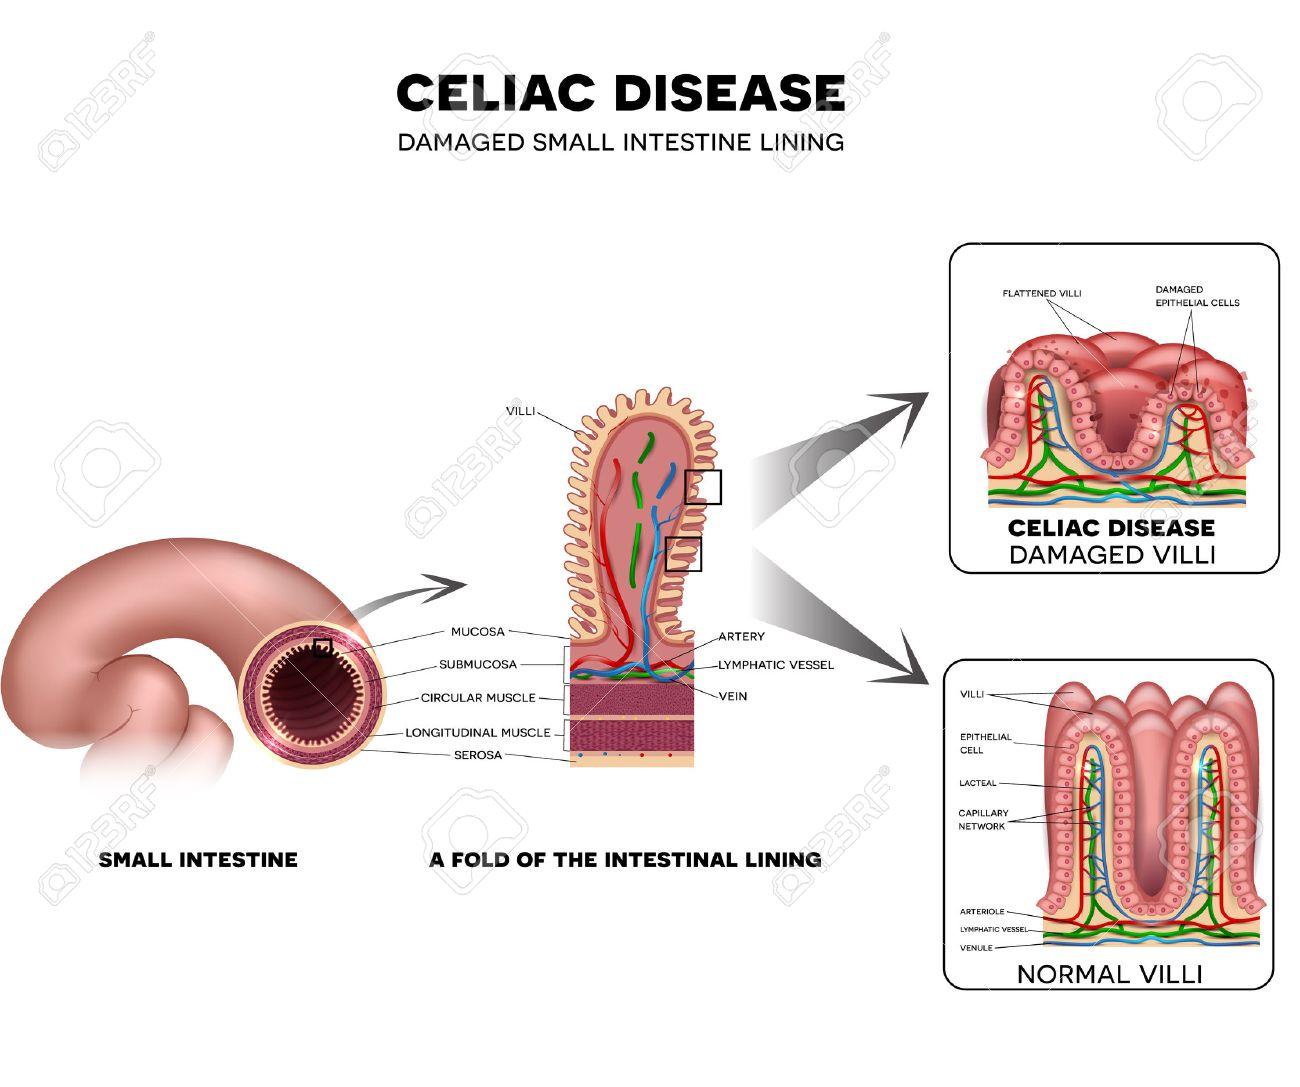 La maladie coeliaque intestin grêle de dommages de doublure. villosités sain et villosités endommagé. L'intestin grêle, un pli de la muqueuse intestinale et villosités. Banque d'images - 54018260